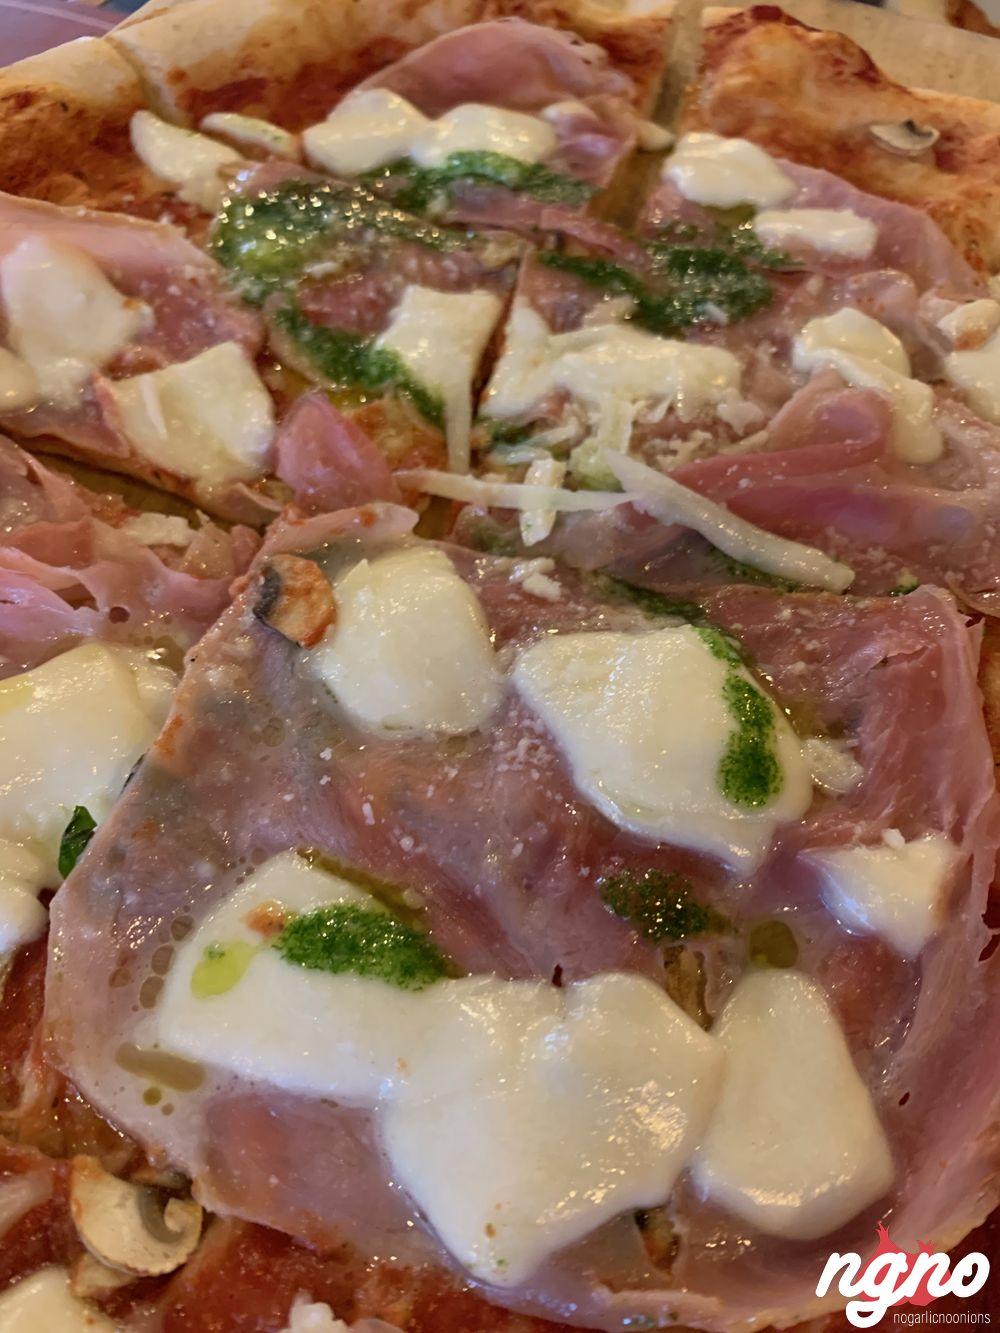 via-roma-pizza-nogarlicnoonions-162019-01-20-05-45-45